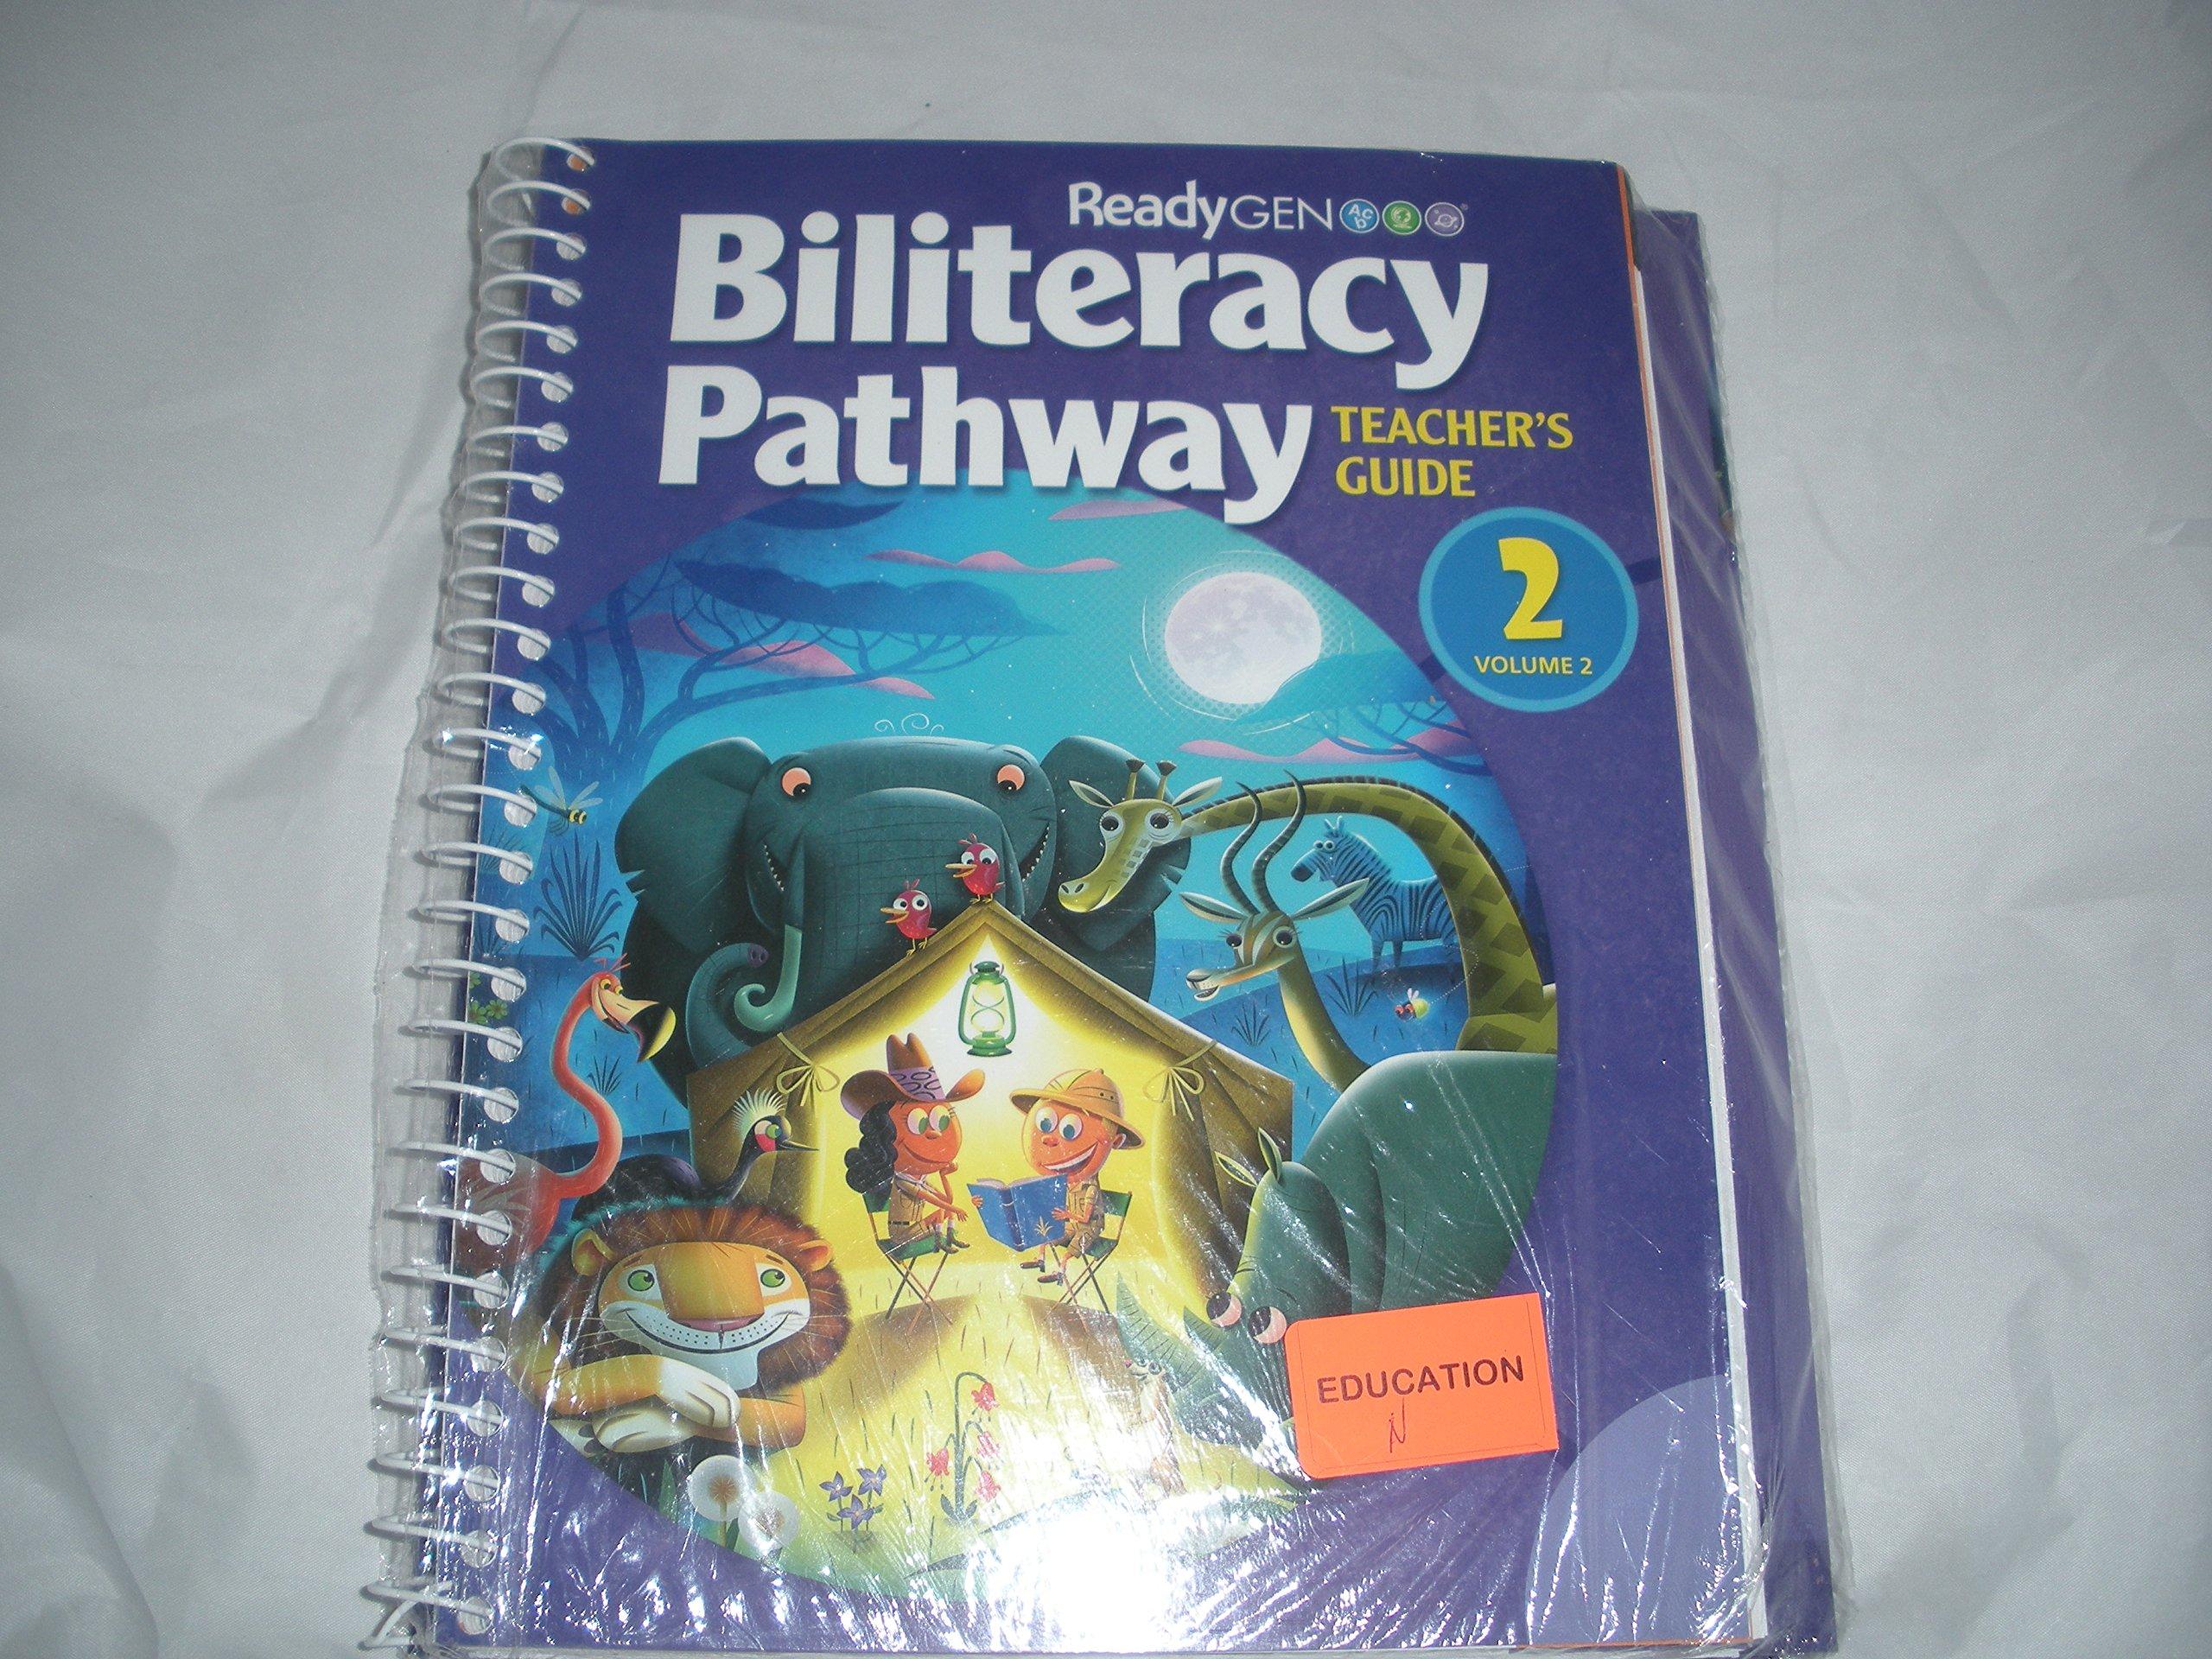 Biliteracy Pathway Teacher's Guide (Grade 2) 2-Volume Set: ReadyGen Pearson:  9780328868780: Amazon.com: Books